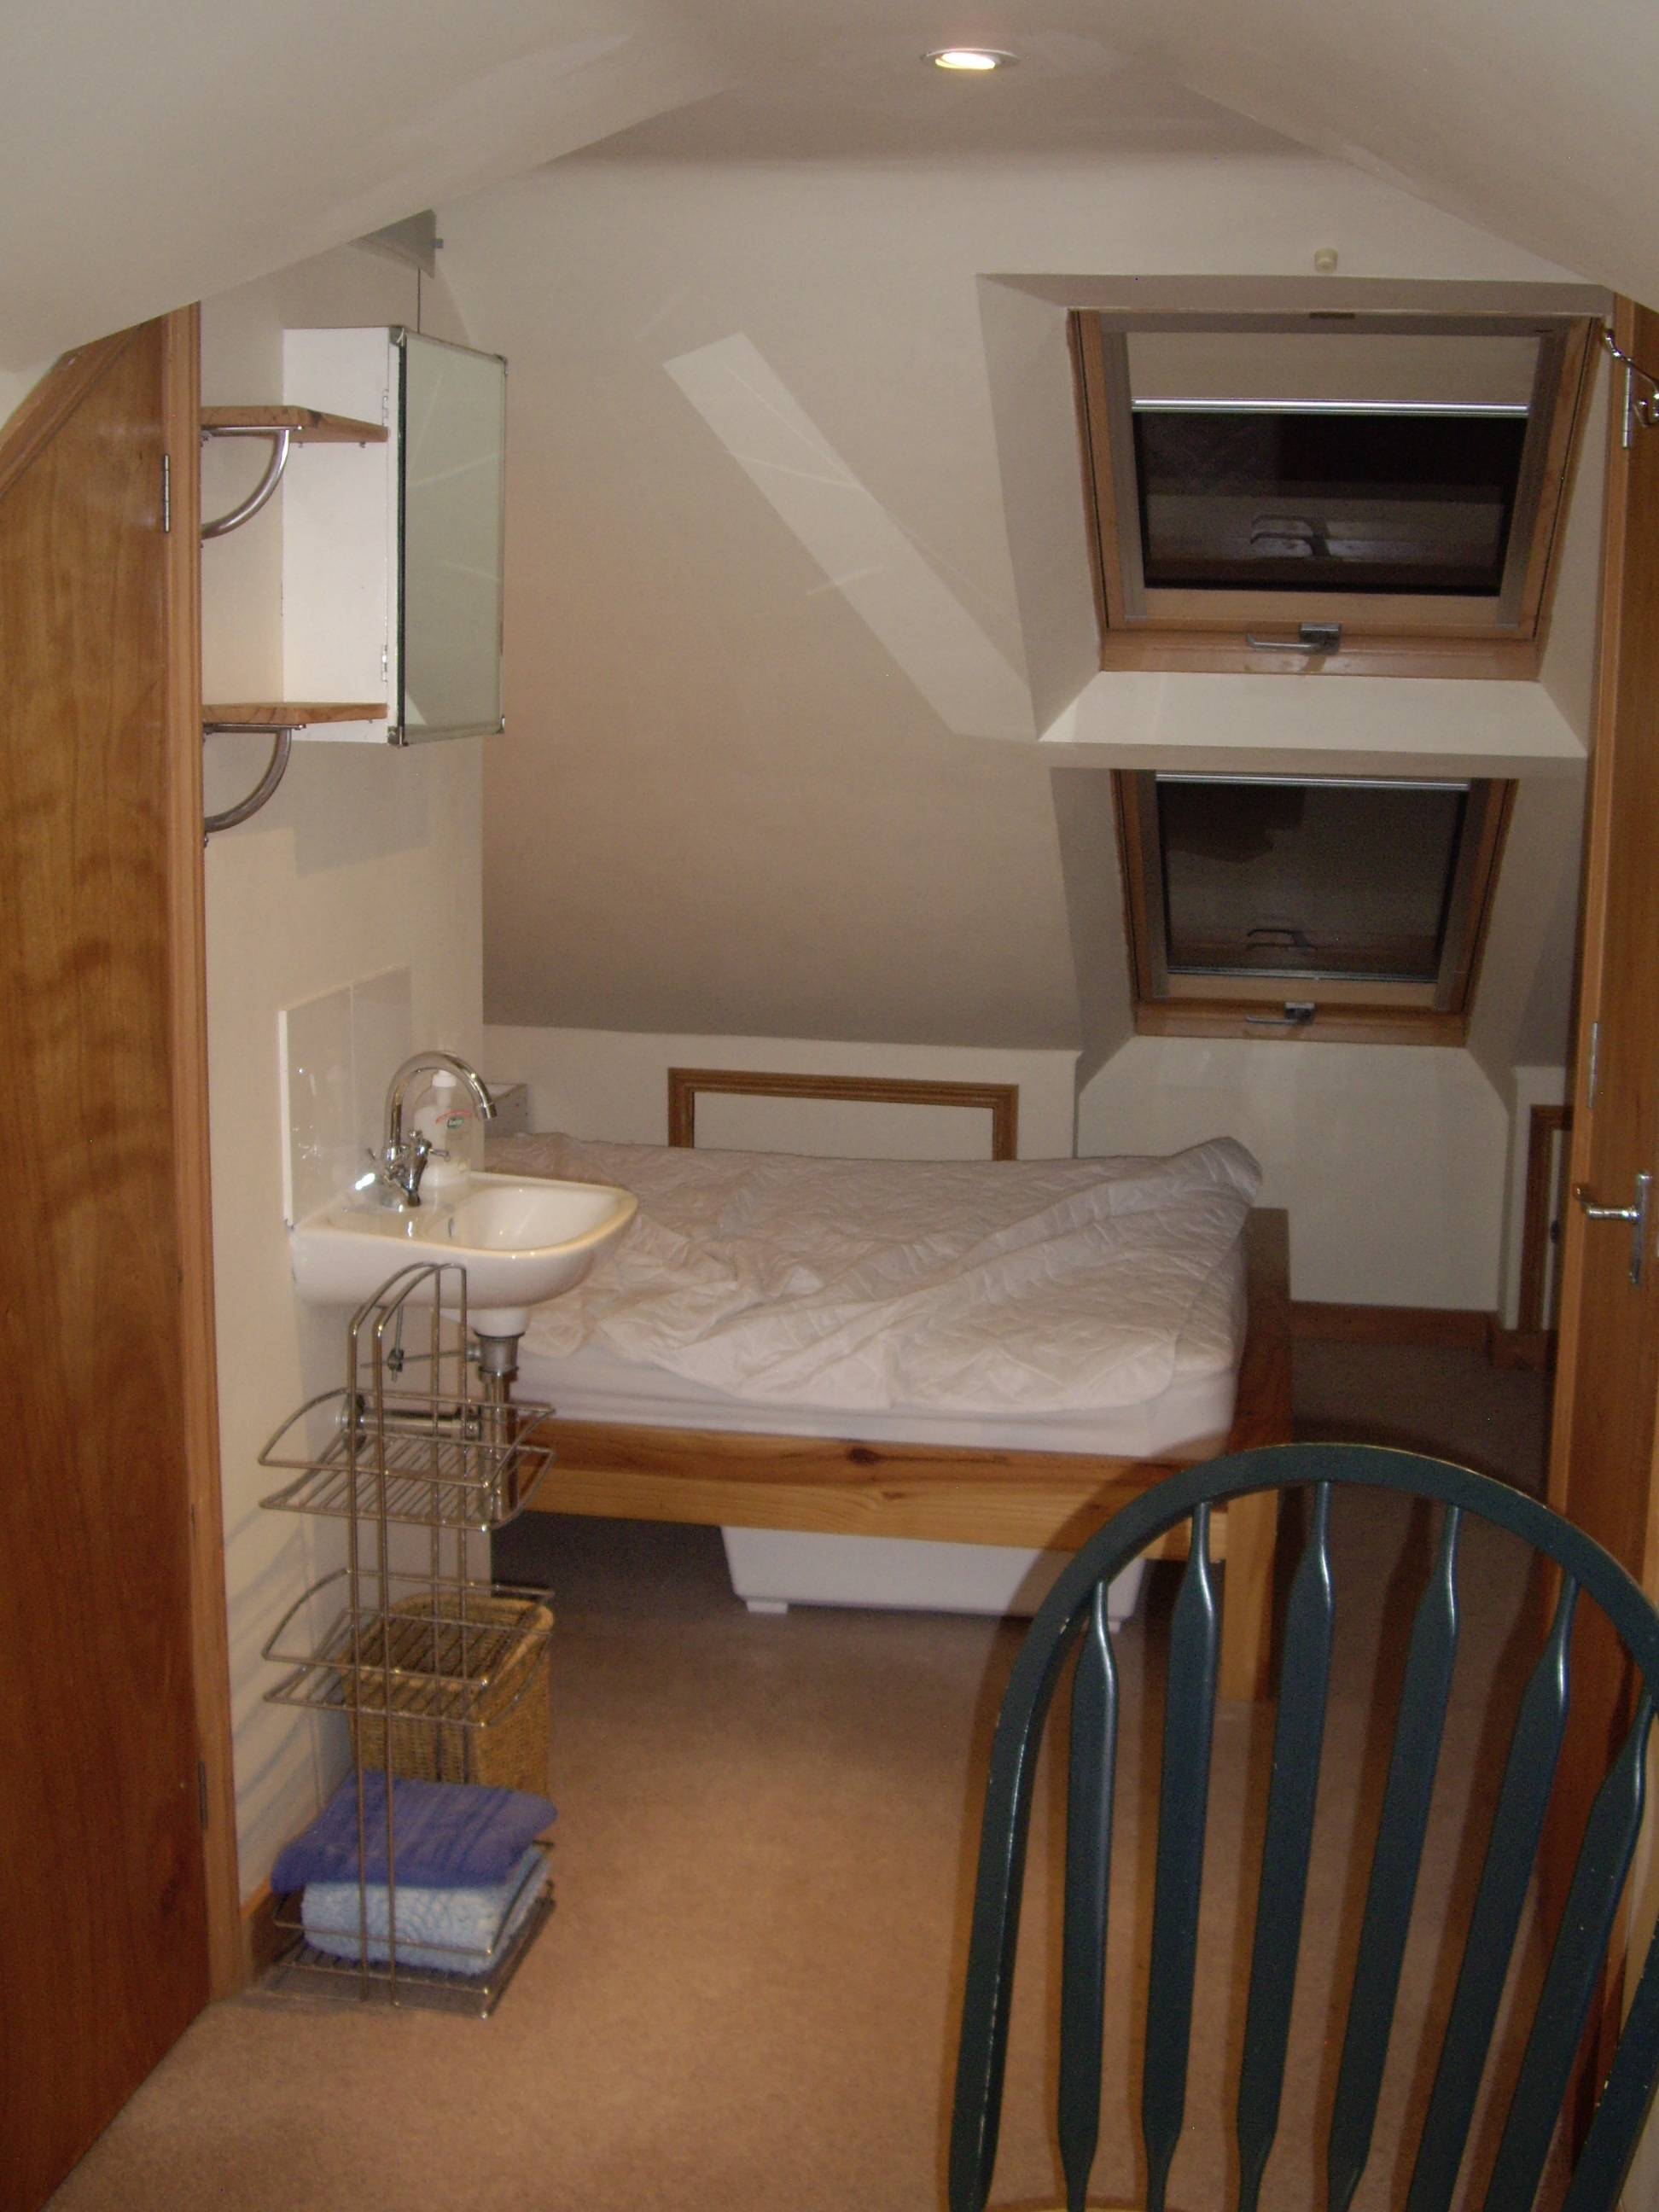 Rental room with en-suite